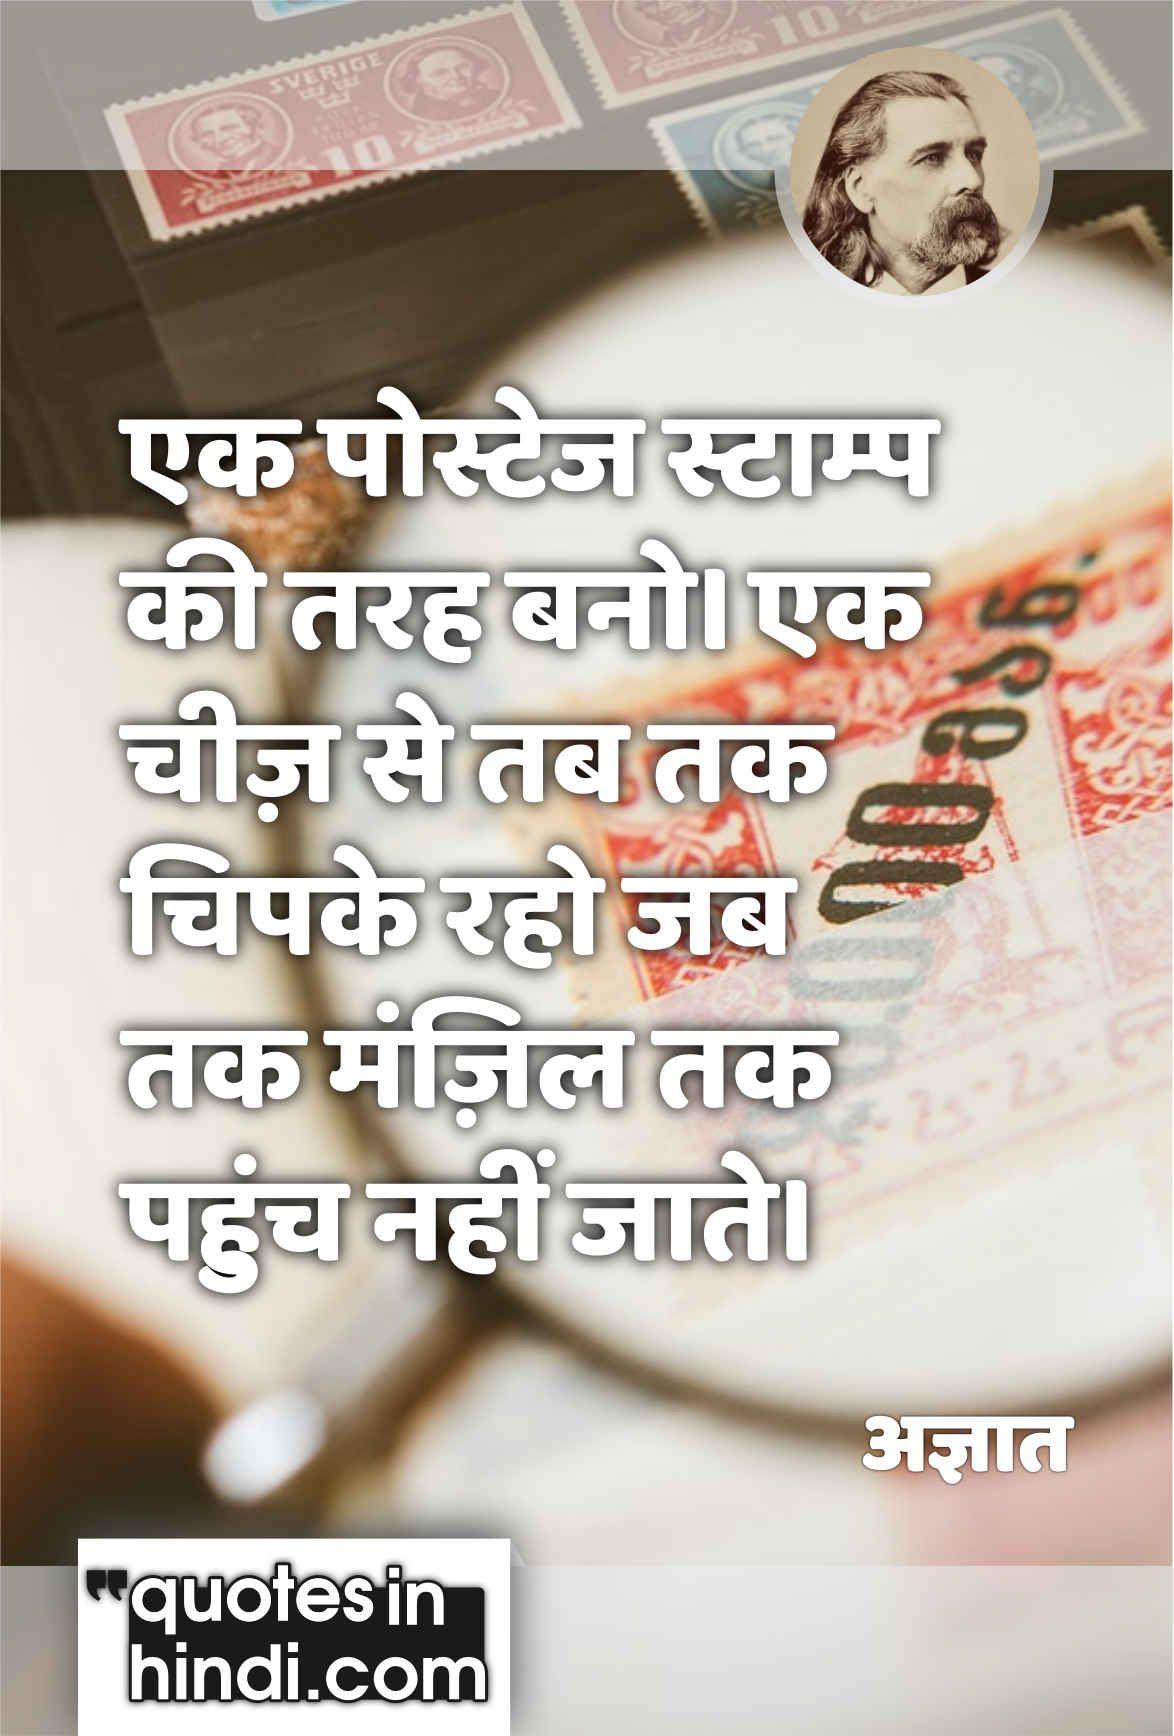 Motivational Quotes in Hindi Rashmi by Rahul Gandhi